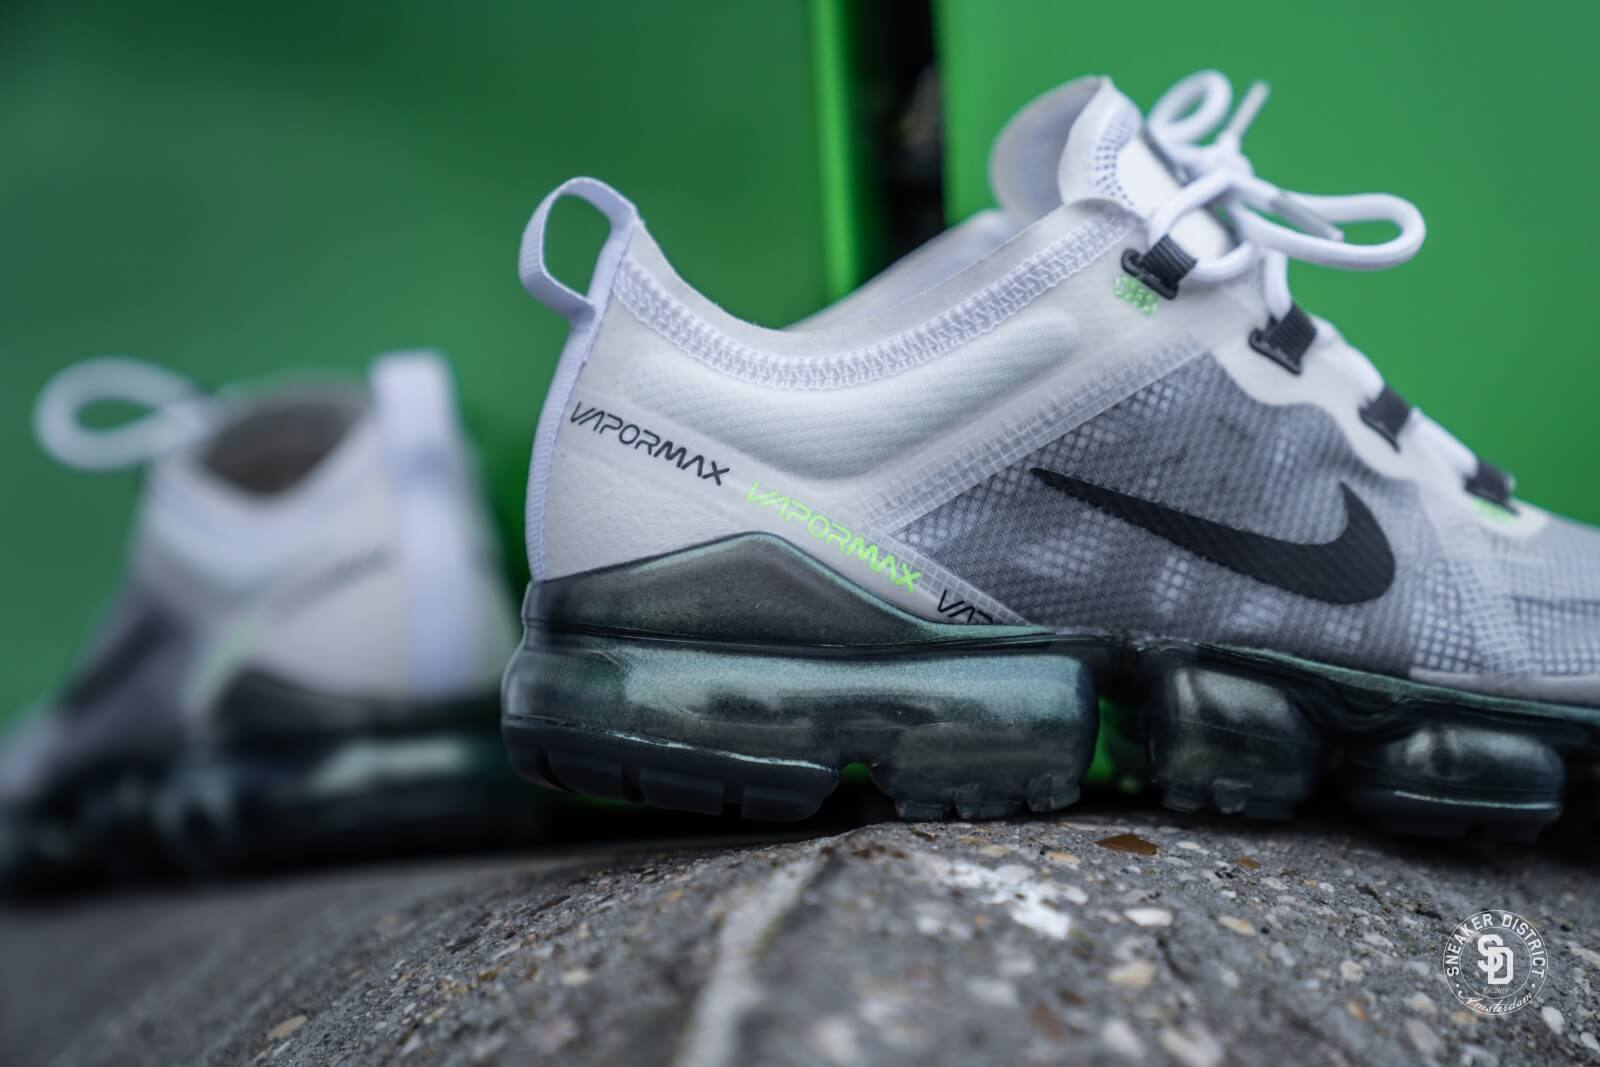 Nike Air Vapormax 2019 Premium White Dark Grey Platinum